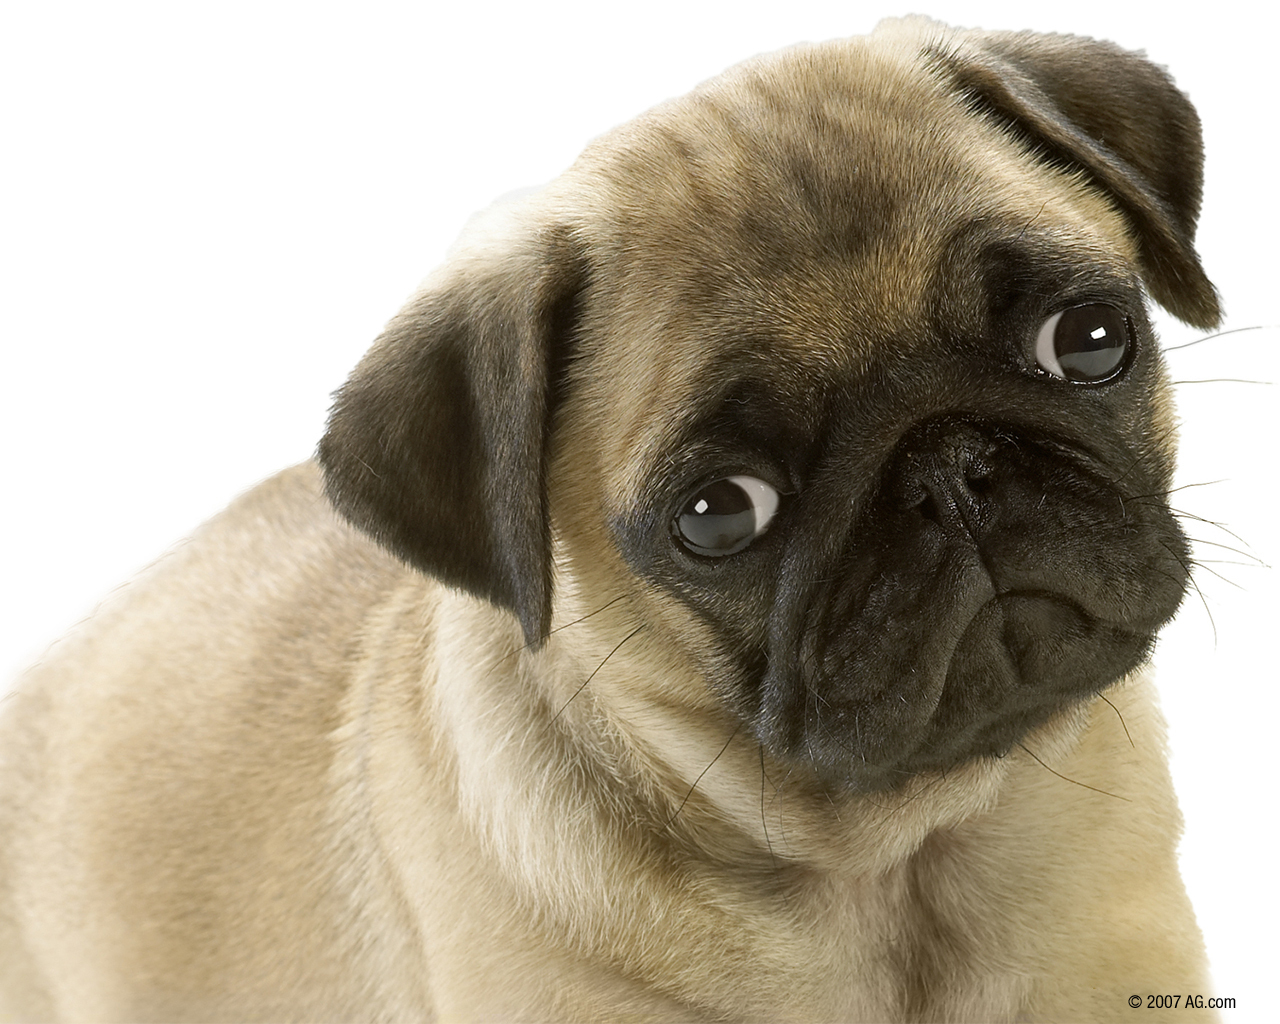 soo cute 3 dogs 1120747 1280 1024